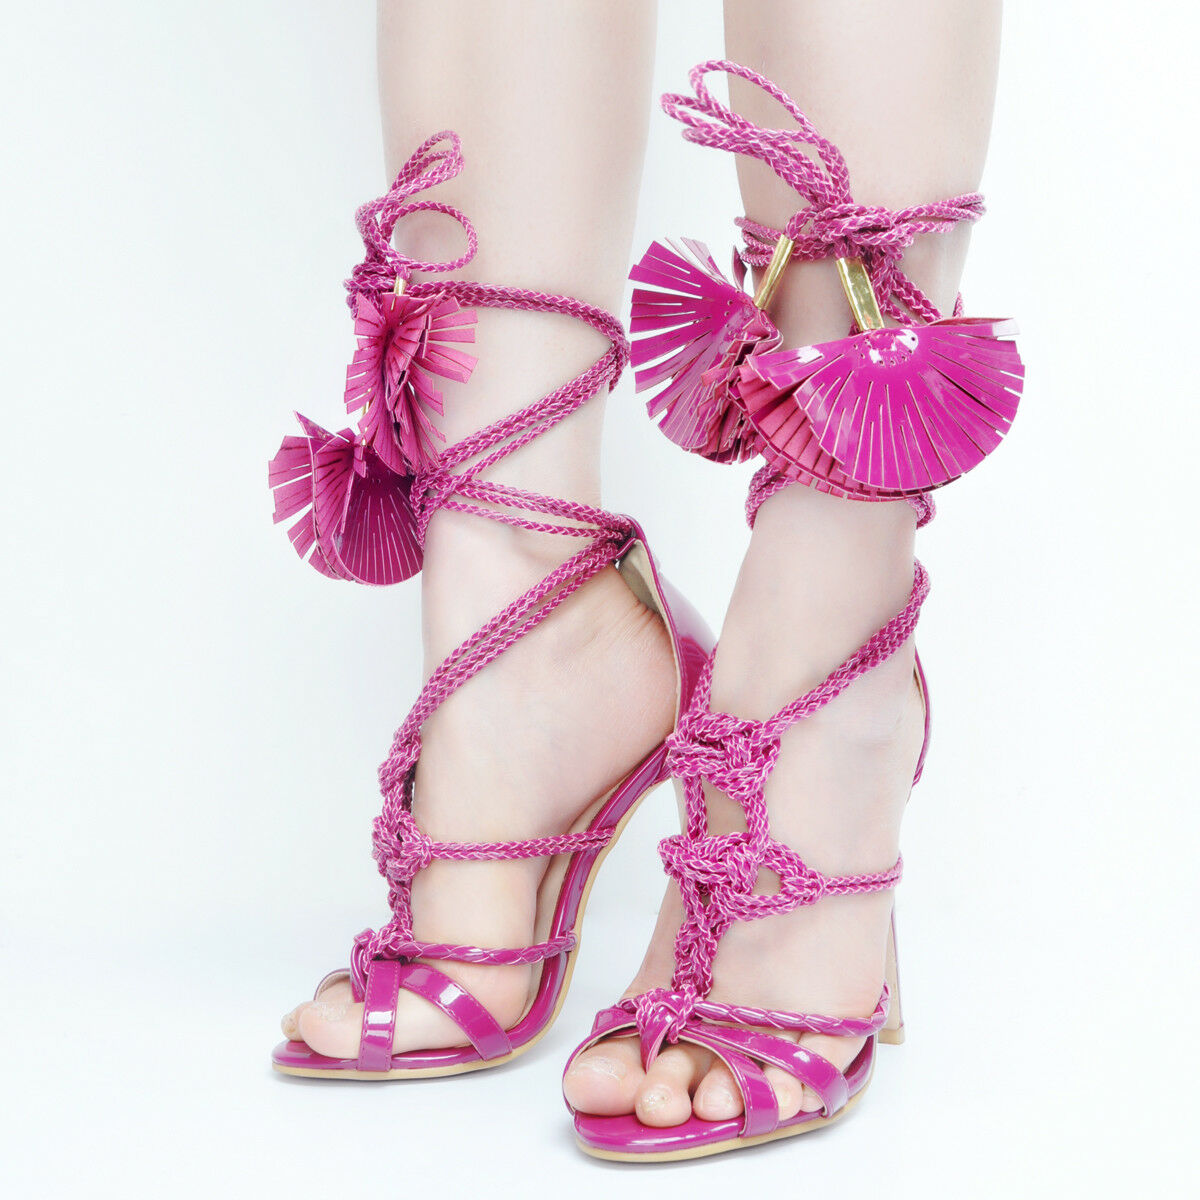 Fashion Women Sandals High Heels Sandals Show Party shoes Women Big Size 4-15